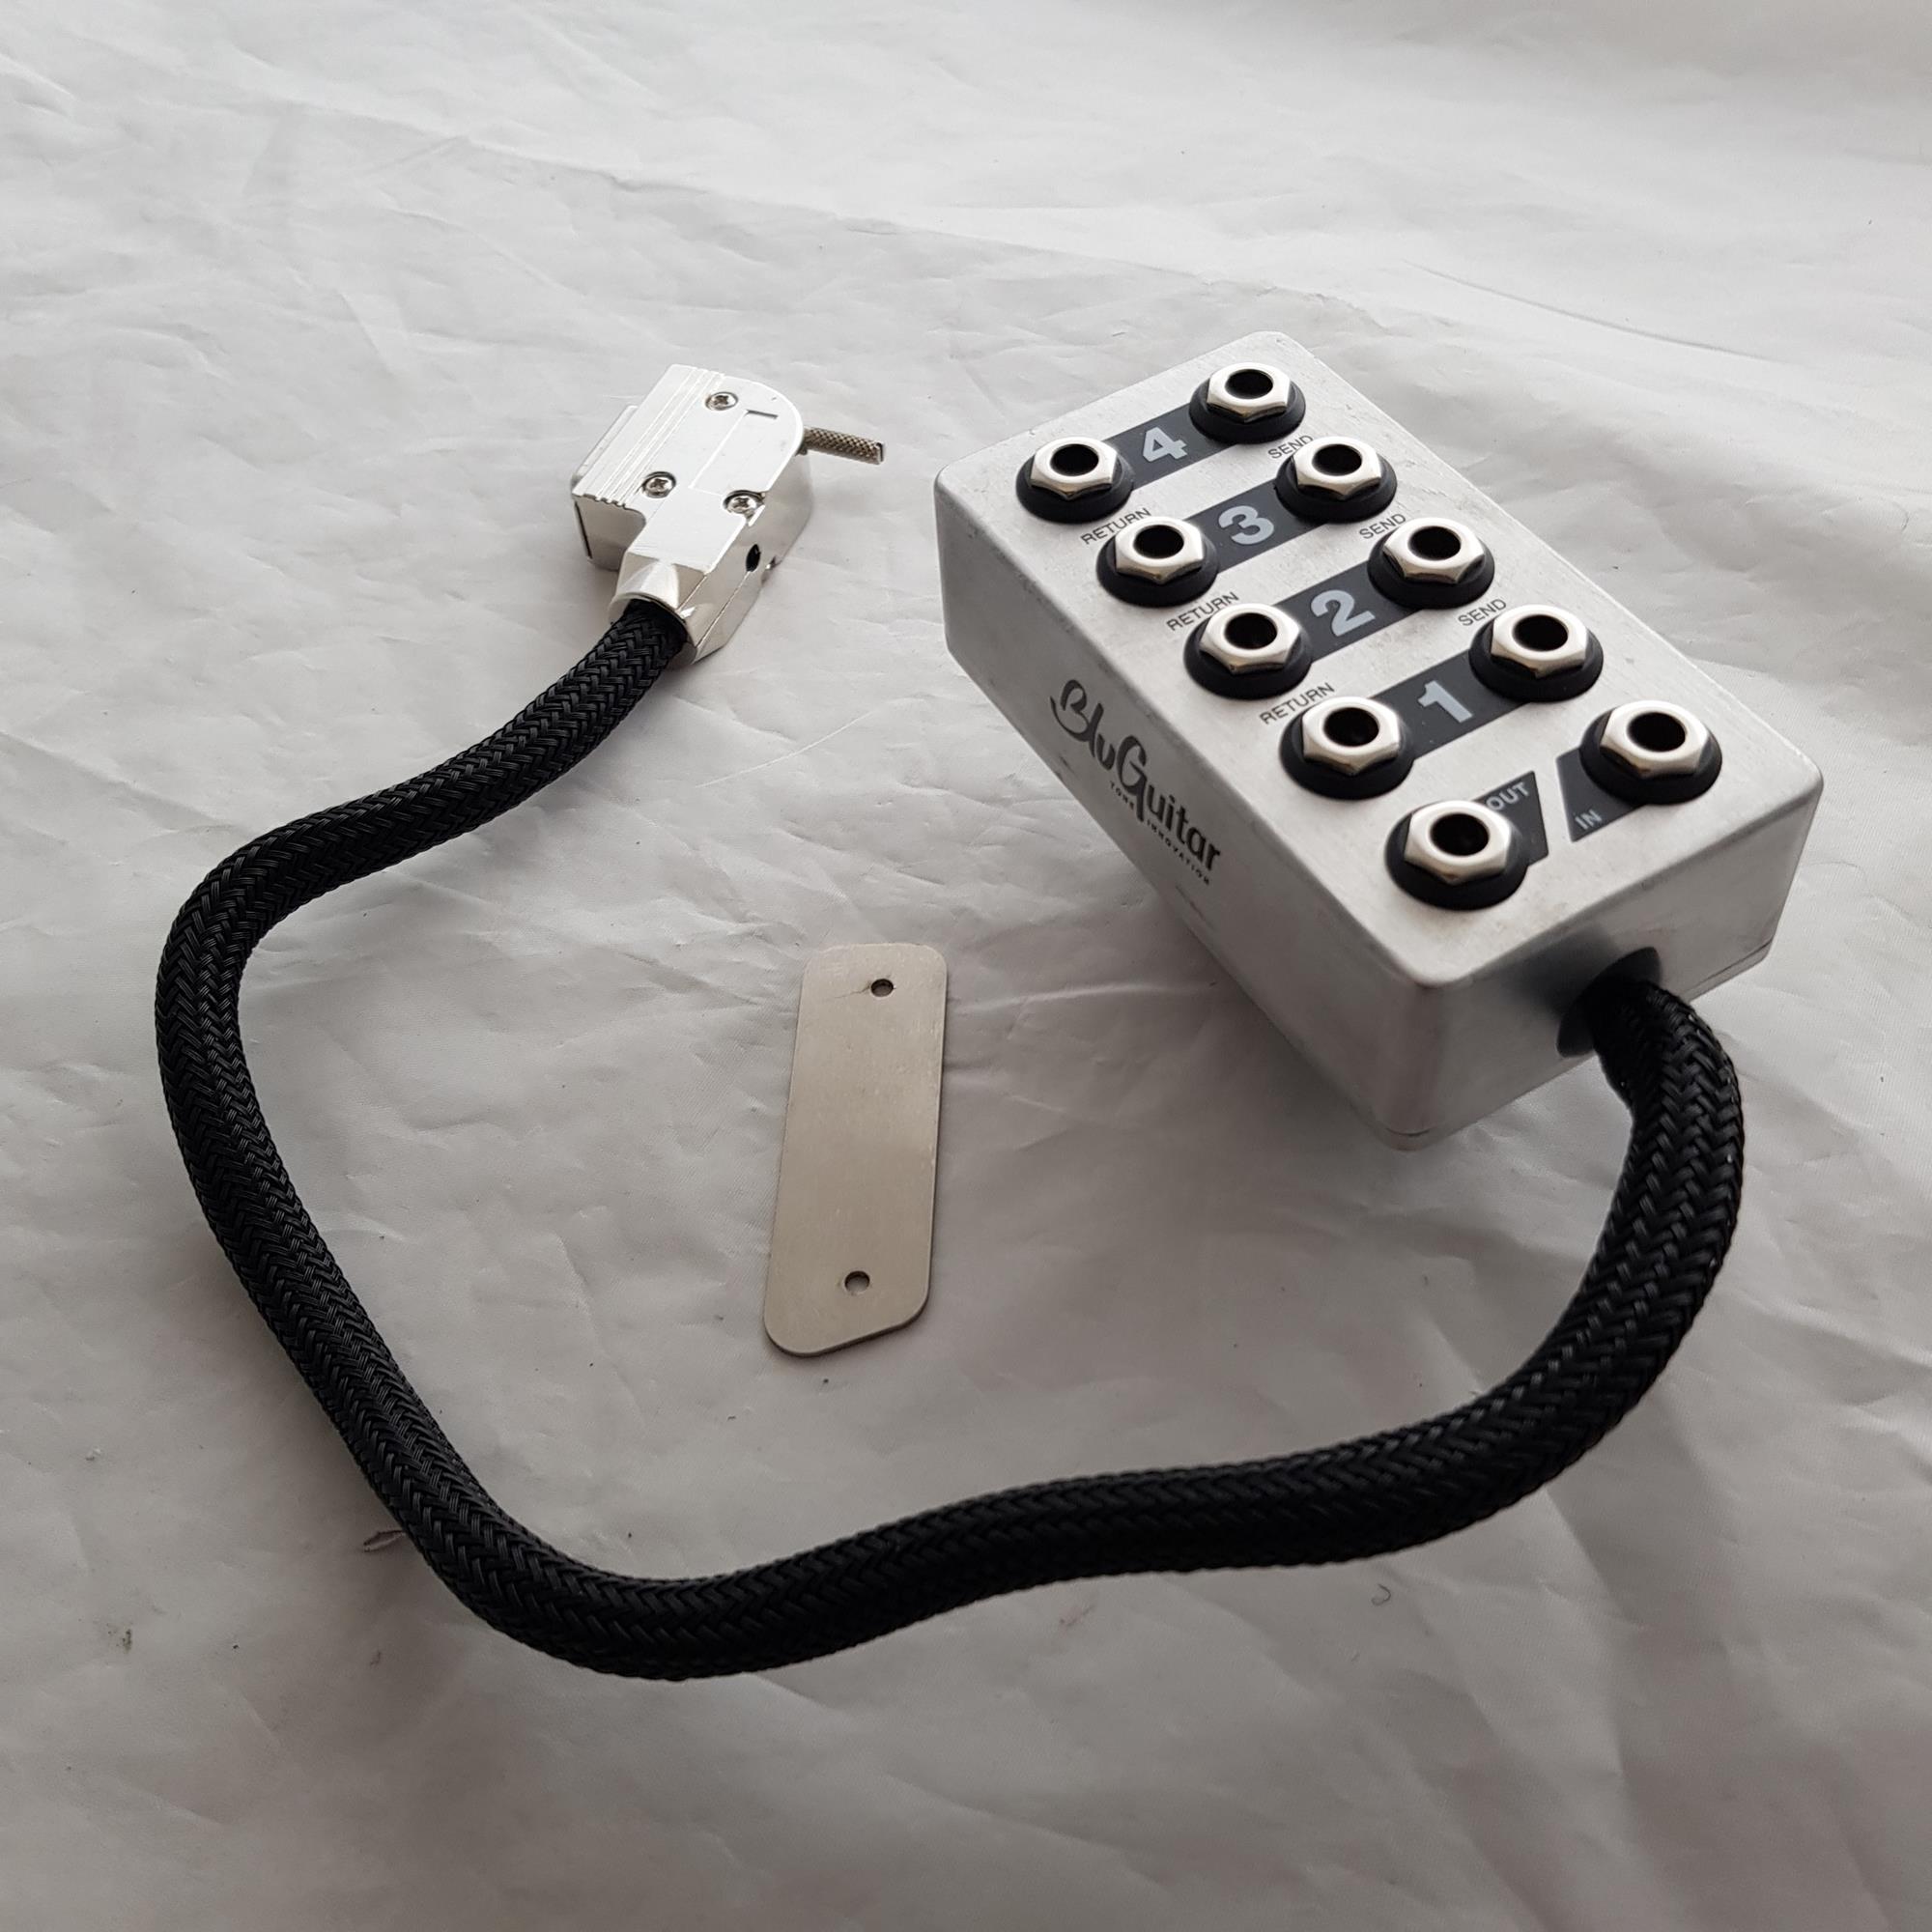 BLUGUITAR-LOOPERKIT-ONLY-PATCH-BOX-sku-1621694586574